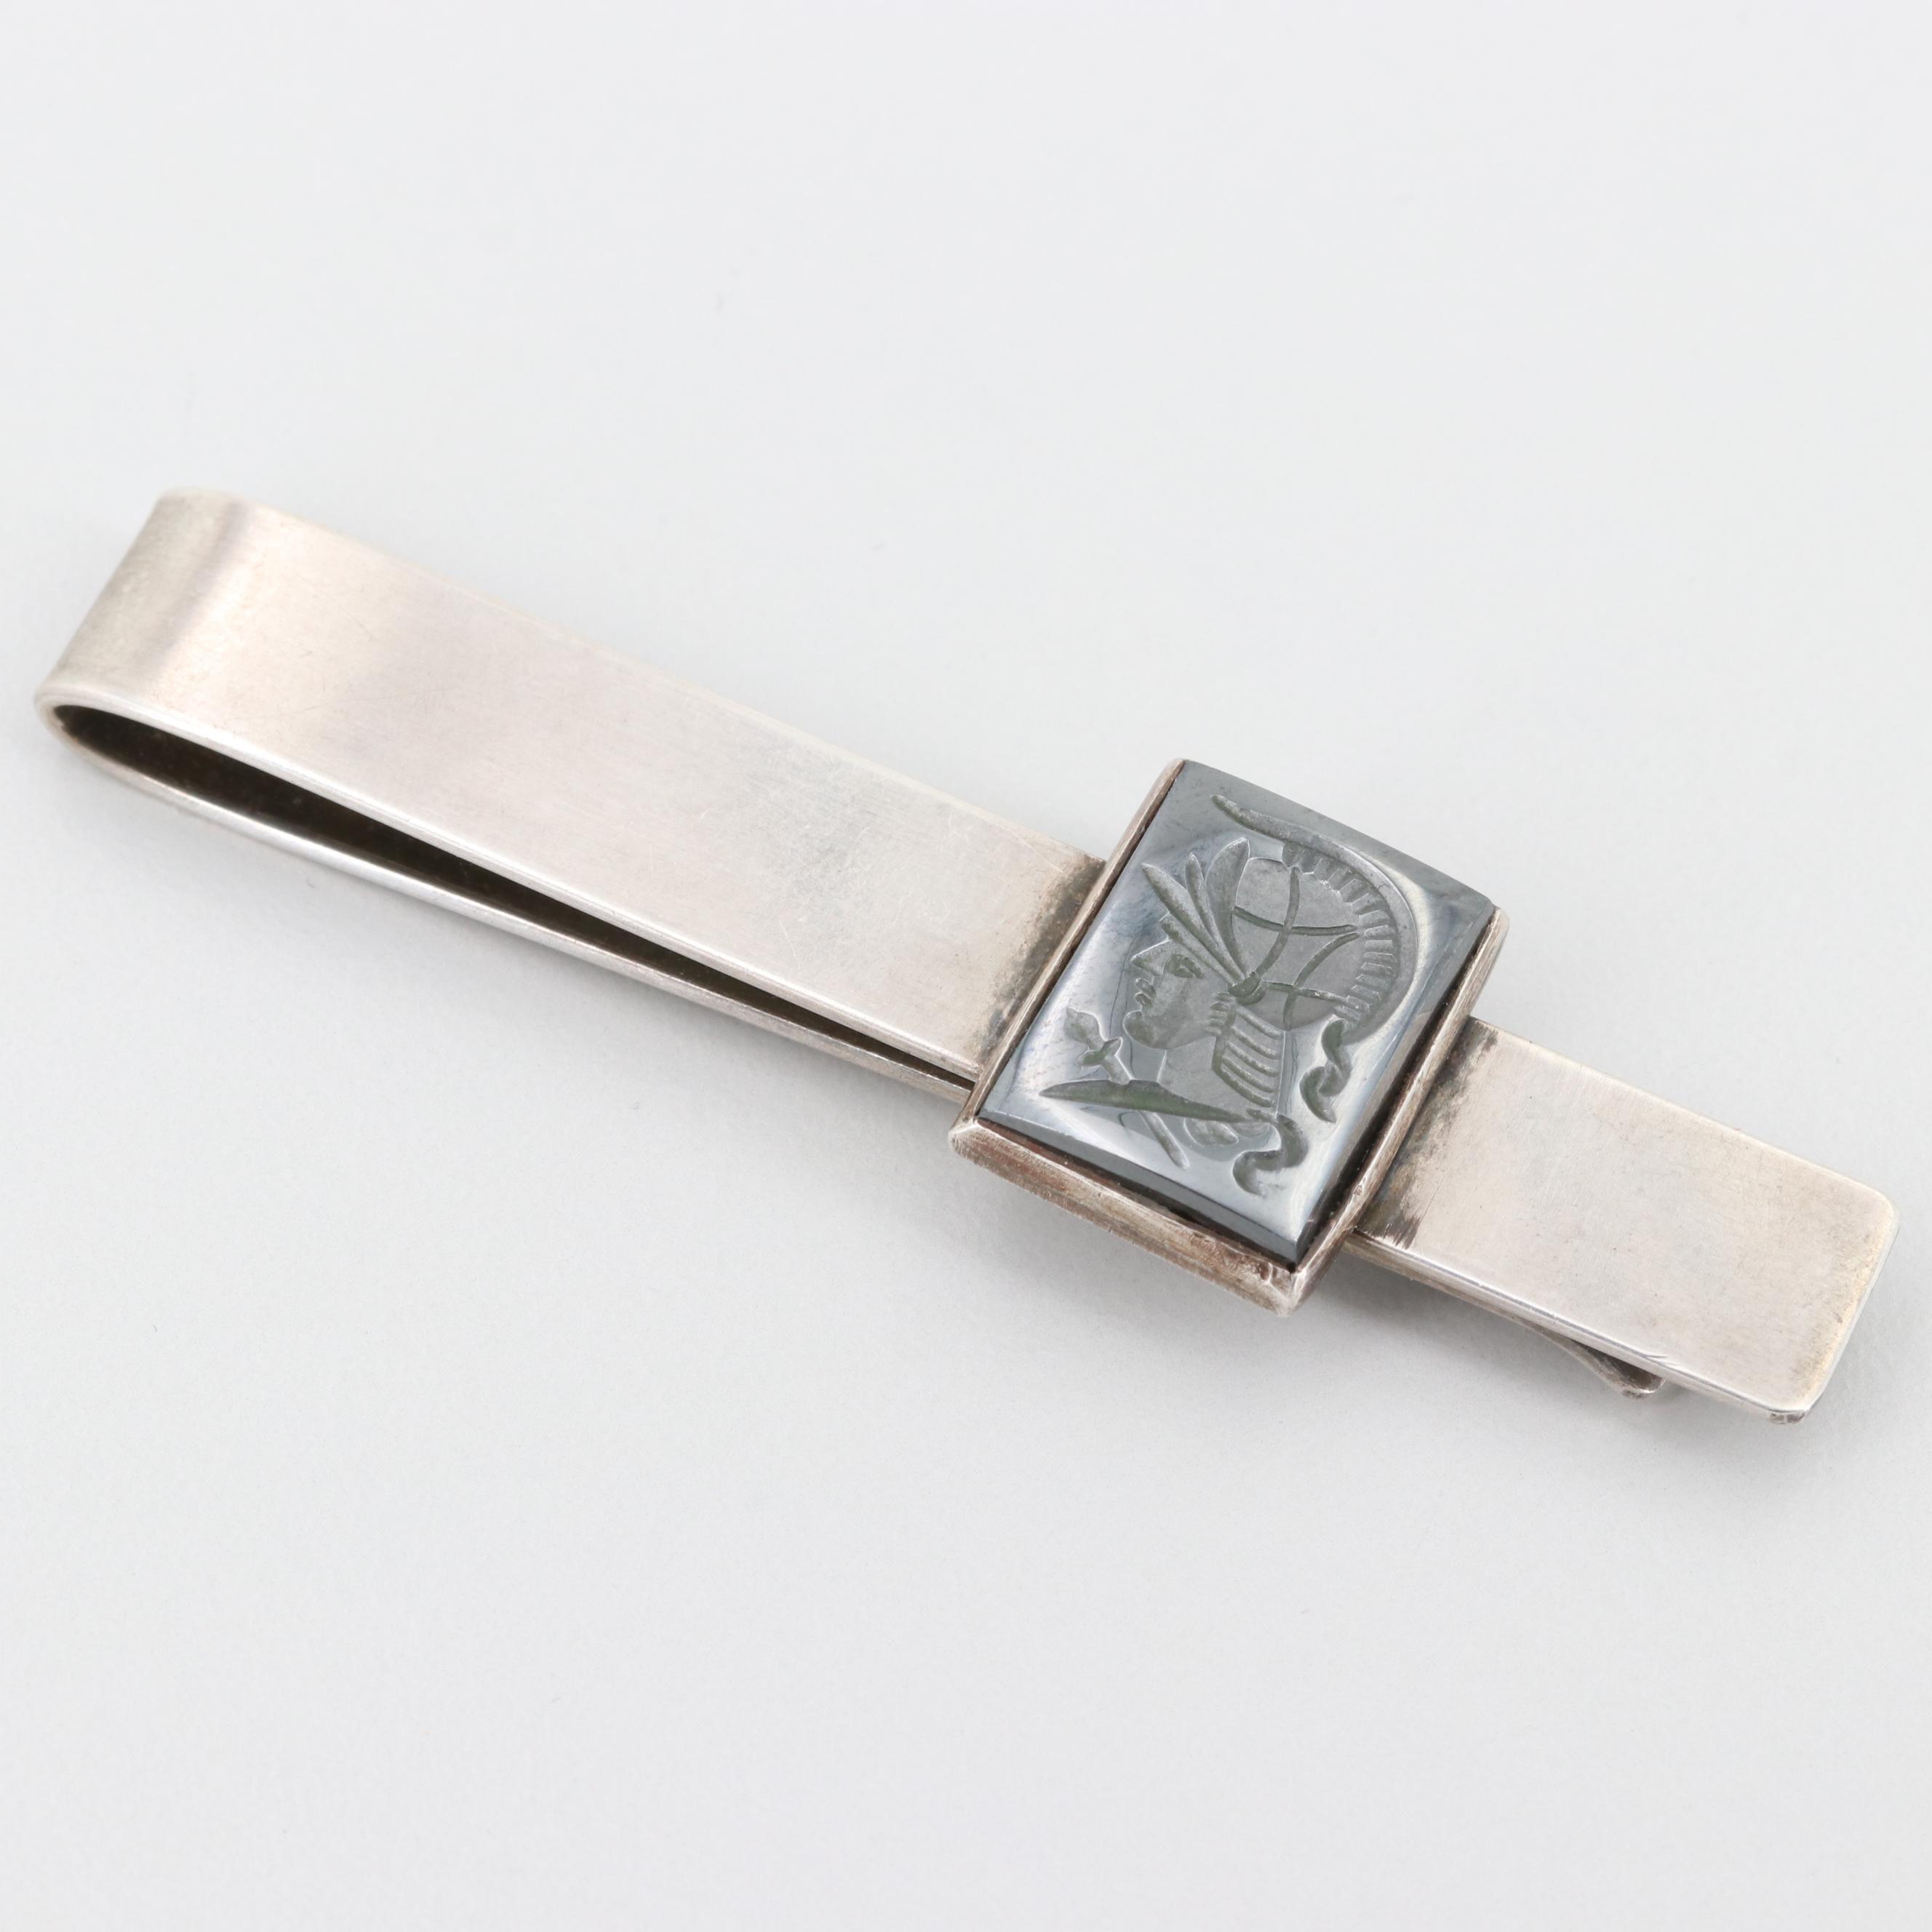 Sterling Silver Hematite Intaglio Carved Cameo Tie Bar